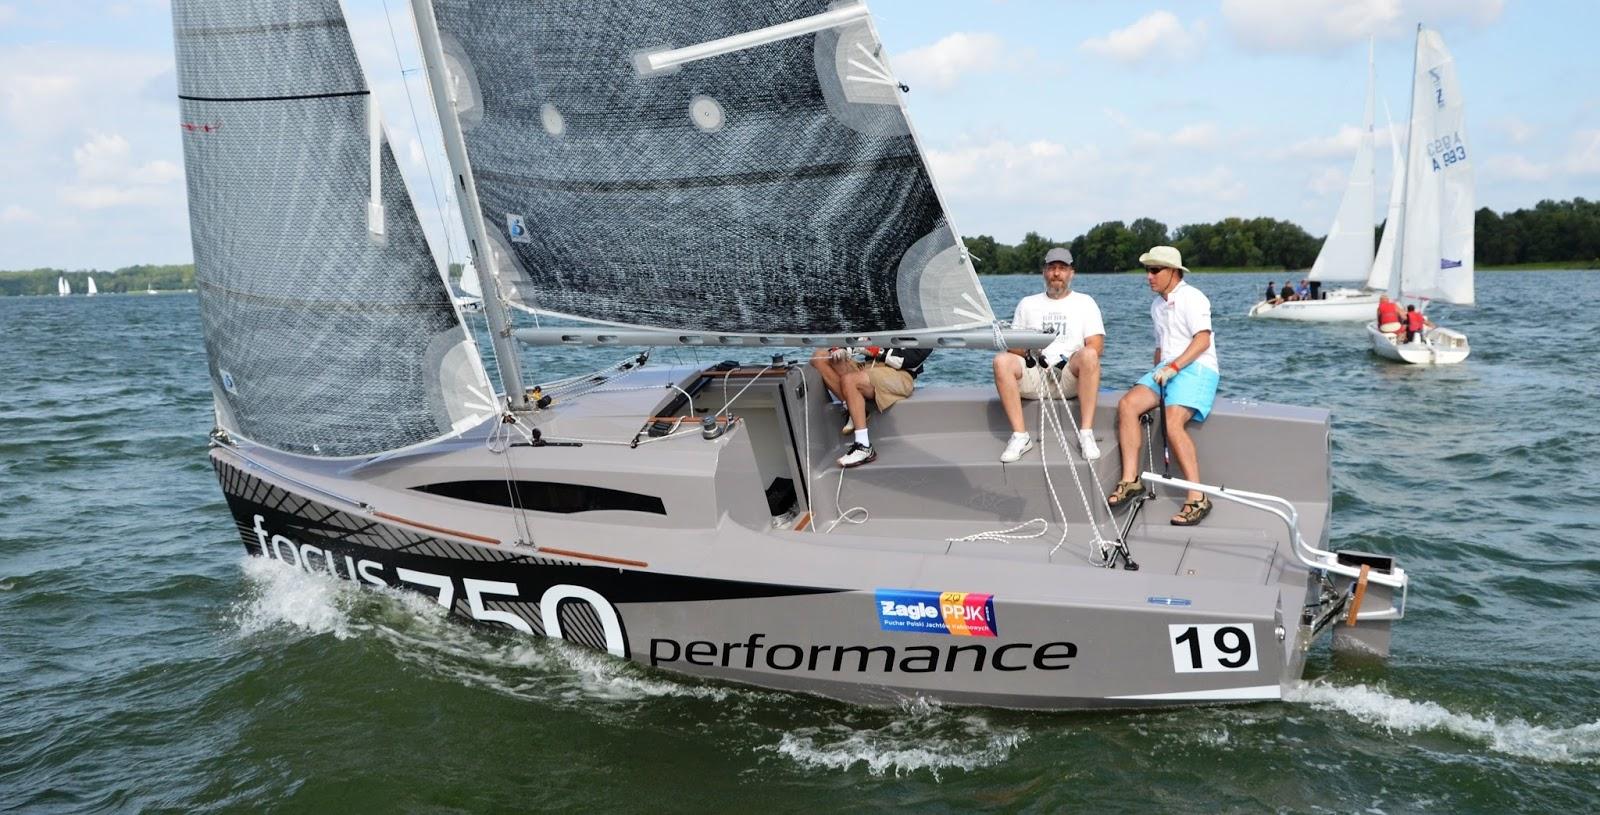 Interesting Sailboats: BENTE24, FOCUS750, VIKO26 - THE LESS